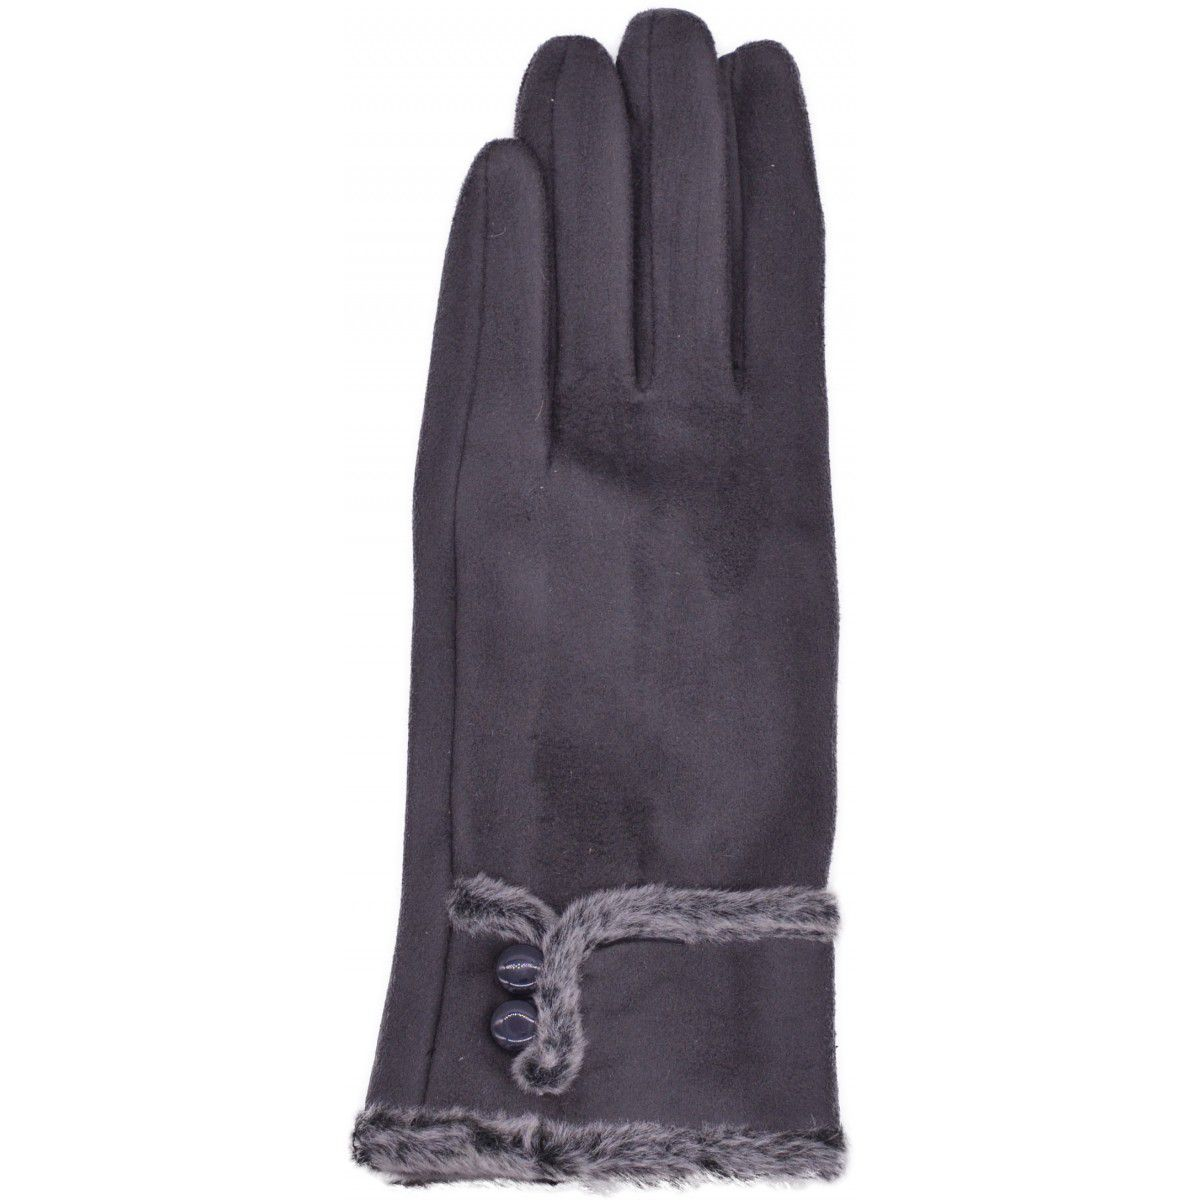 eae27112gr_gants-pin-up-retro-vintage-glamour-40-s-50-s-marie-gris